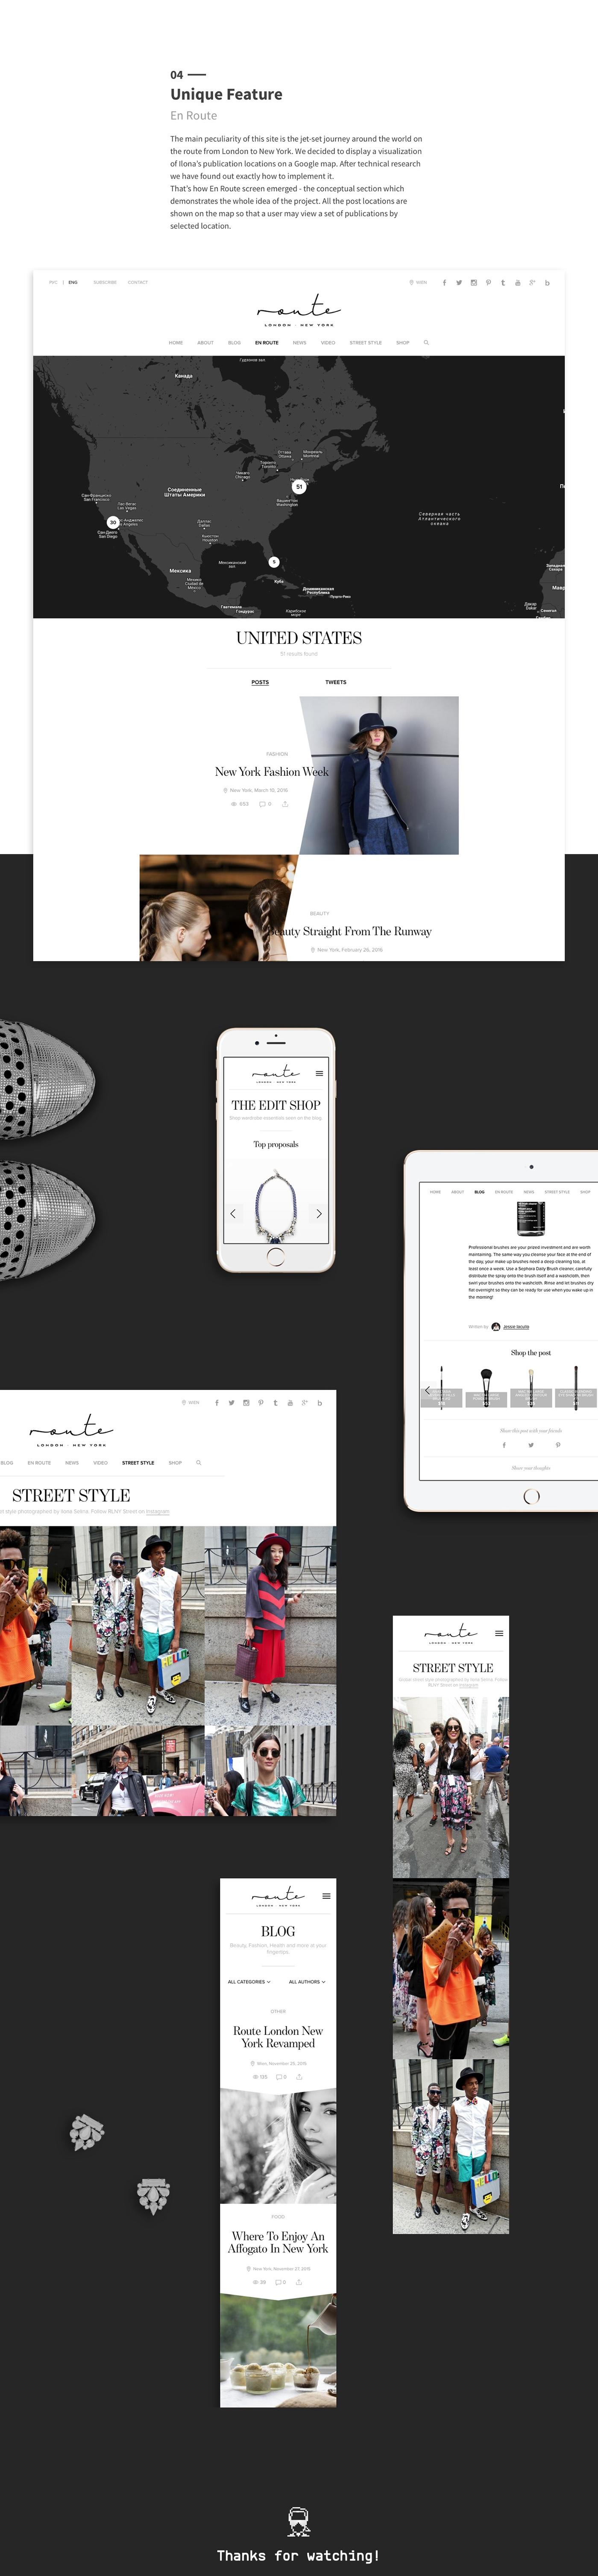 fashion blog,jet set,online store,Travel,interactive map